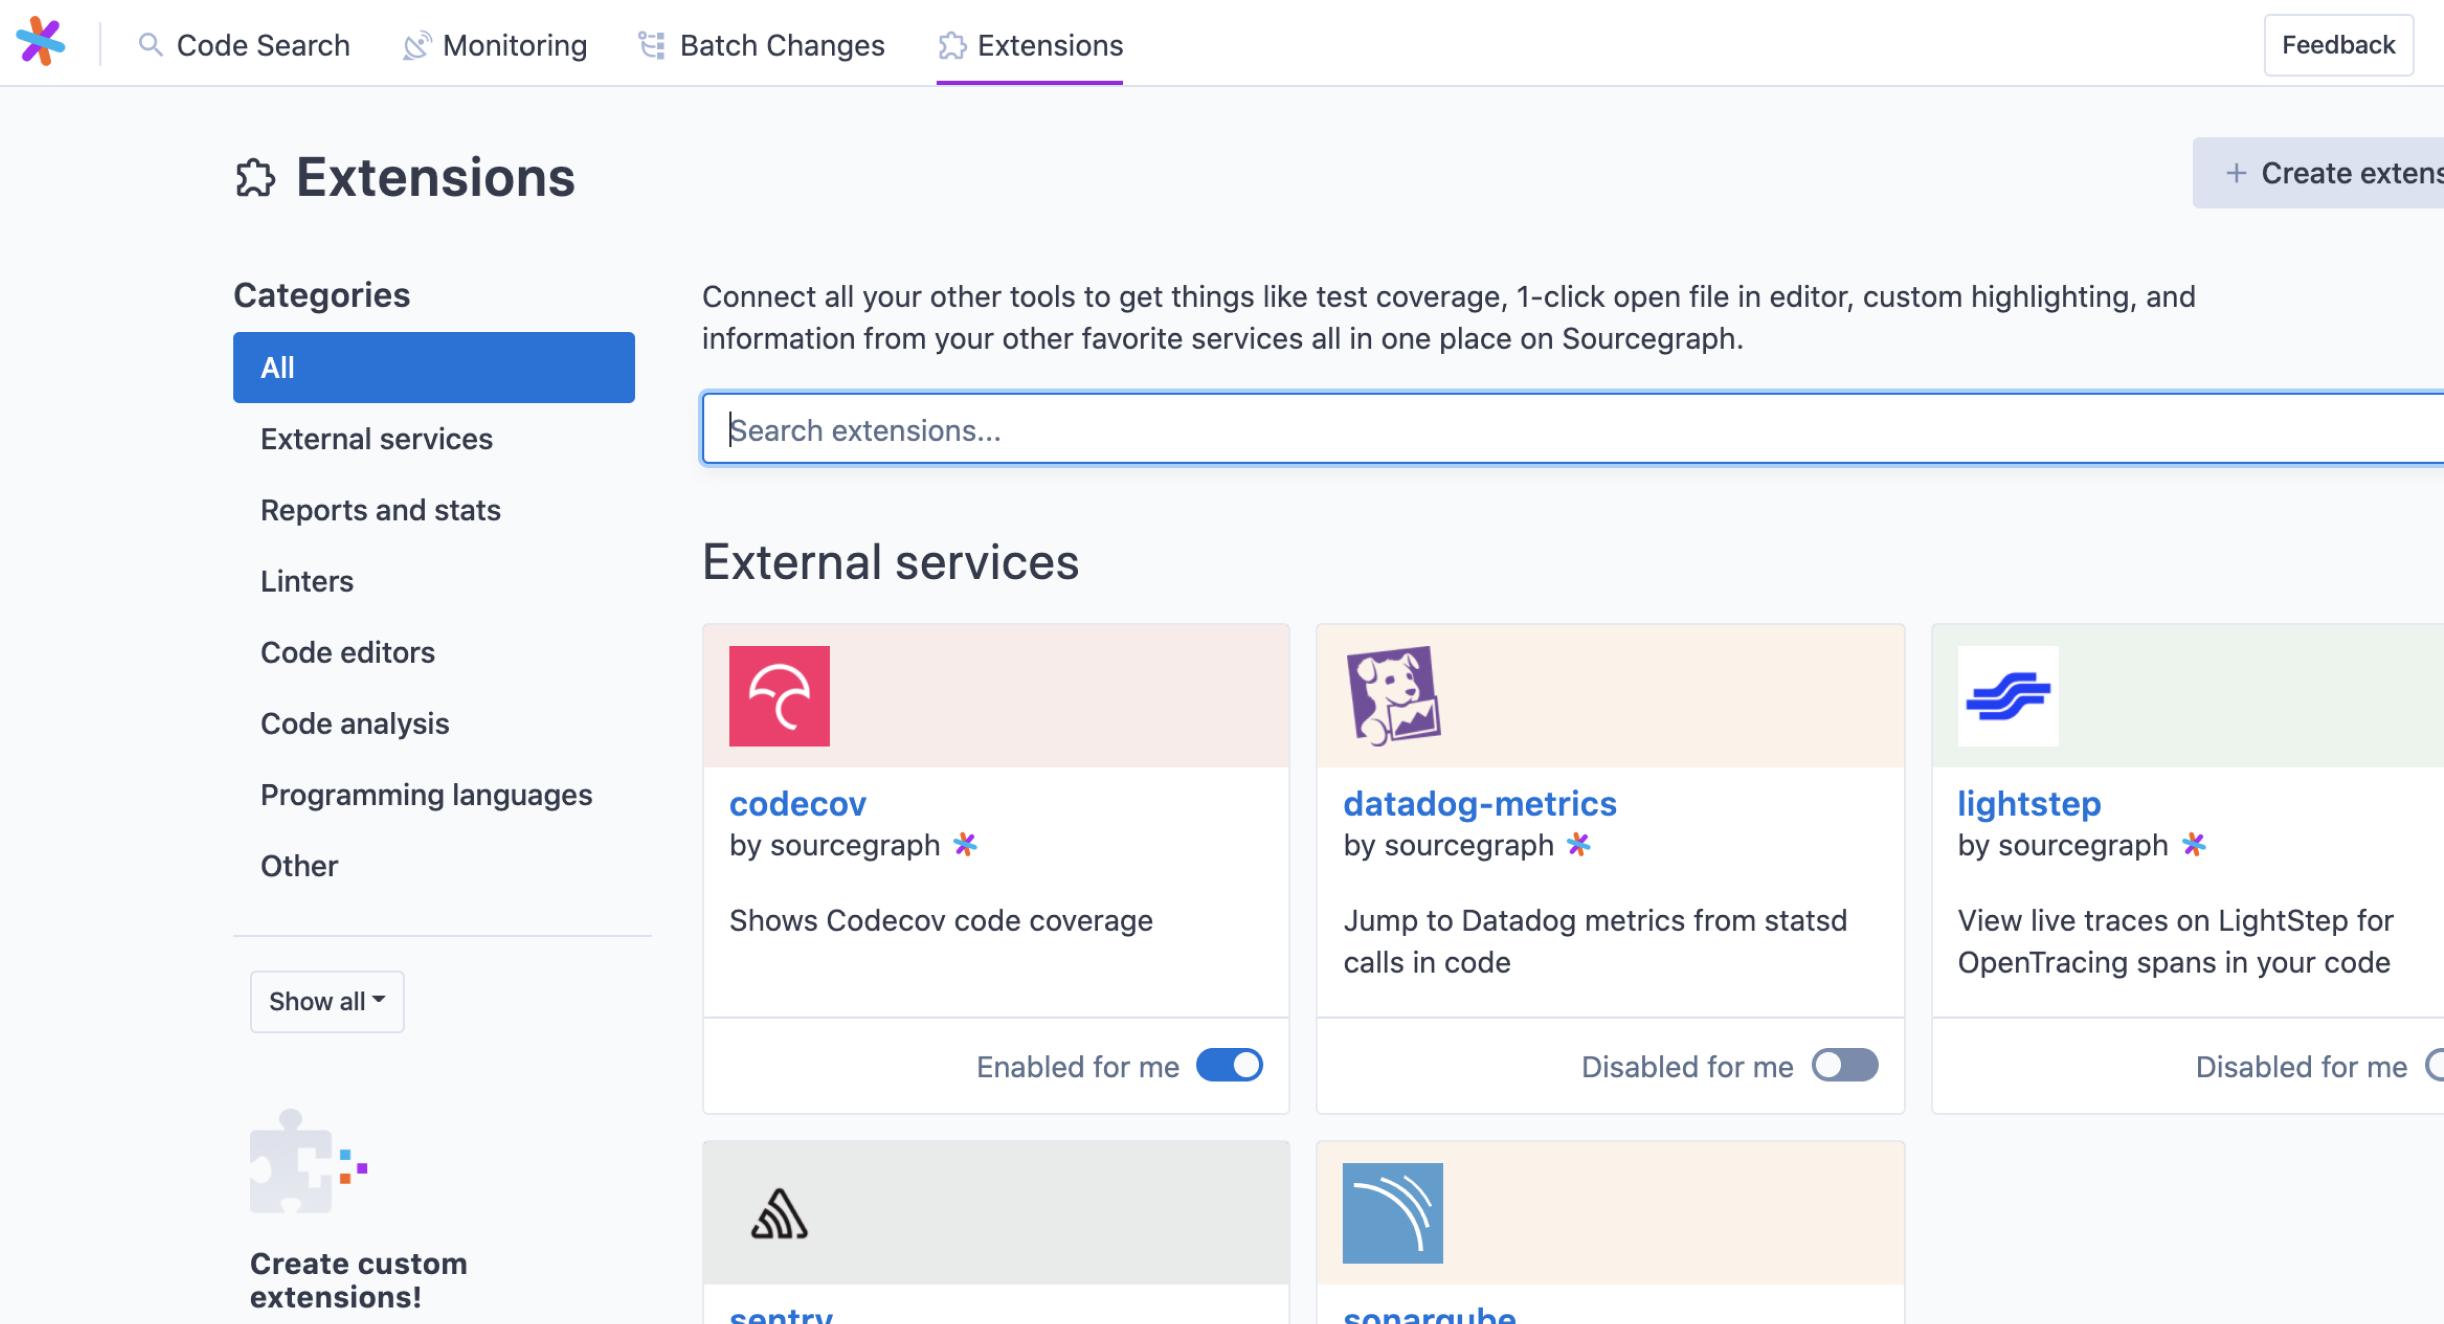 exntensions redesign screenshot